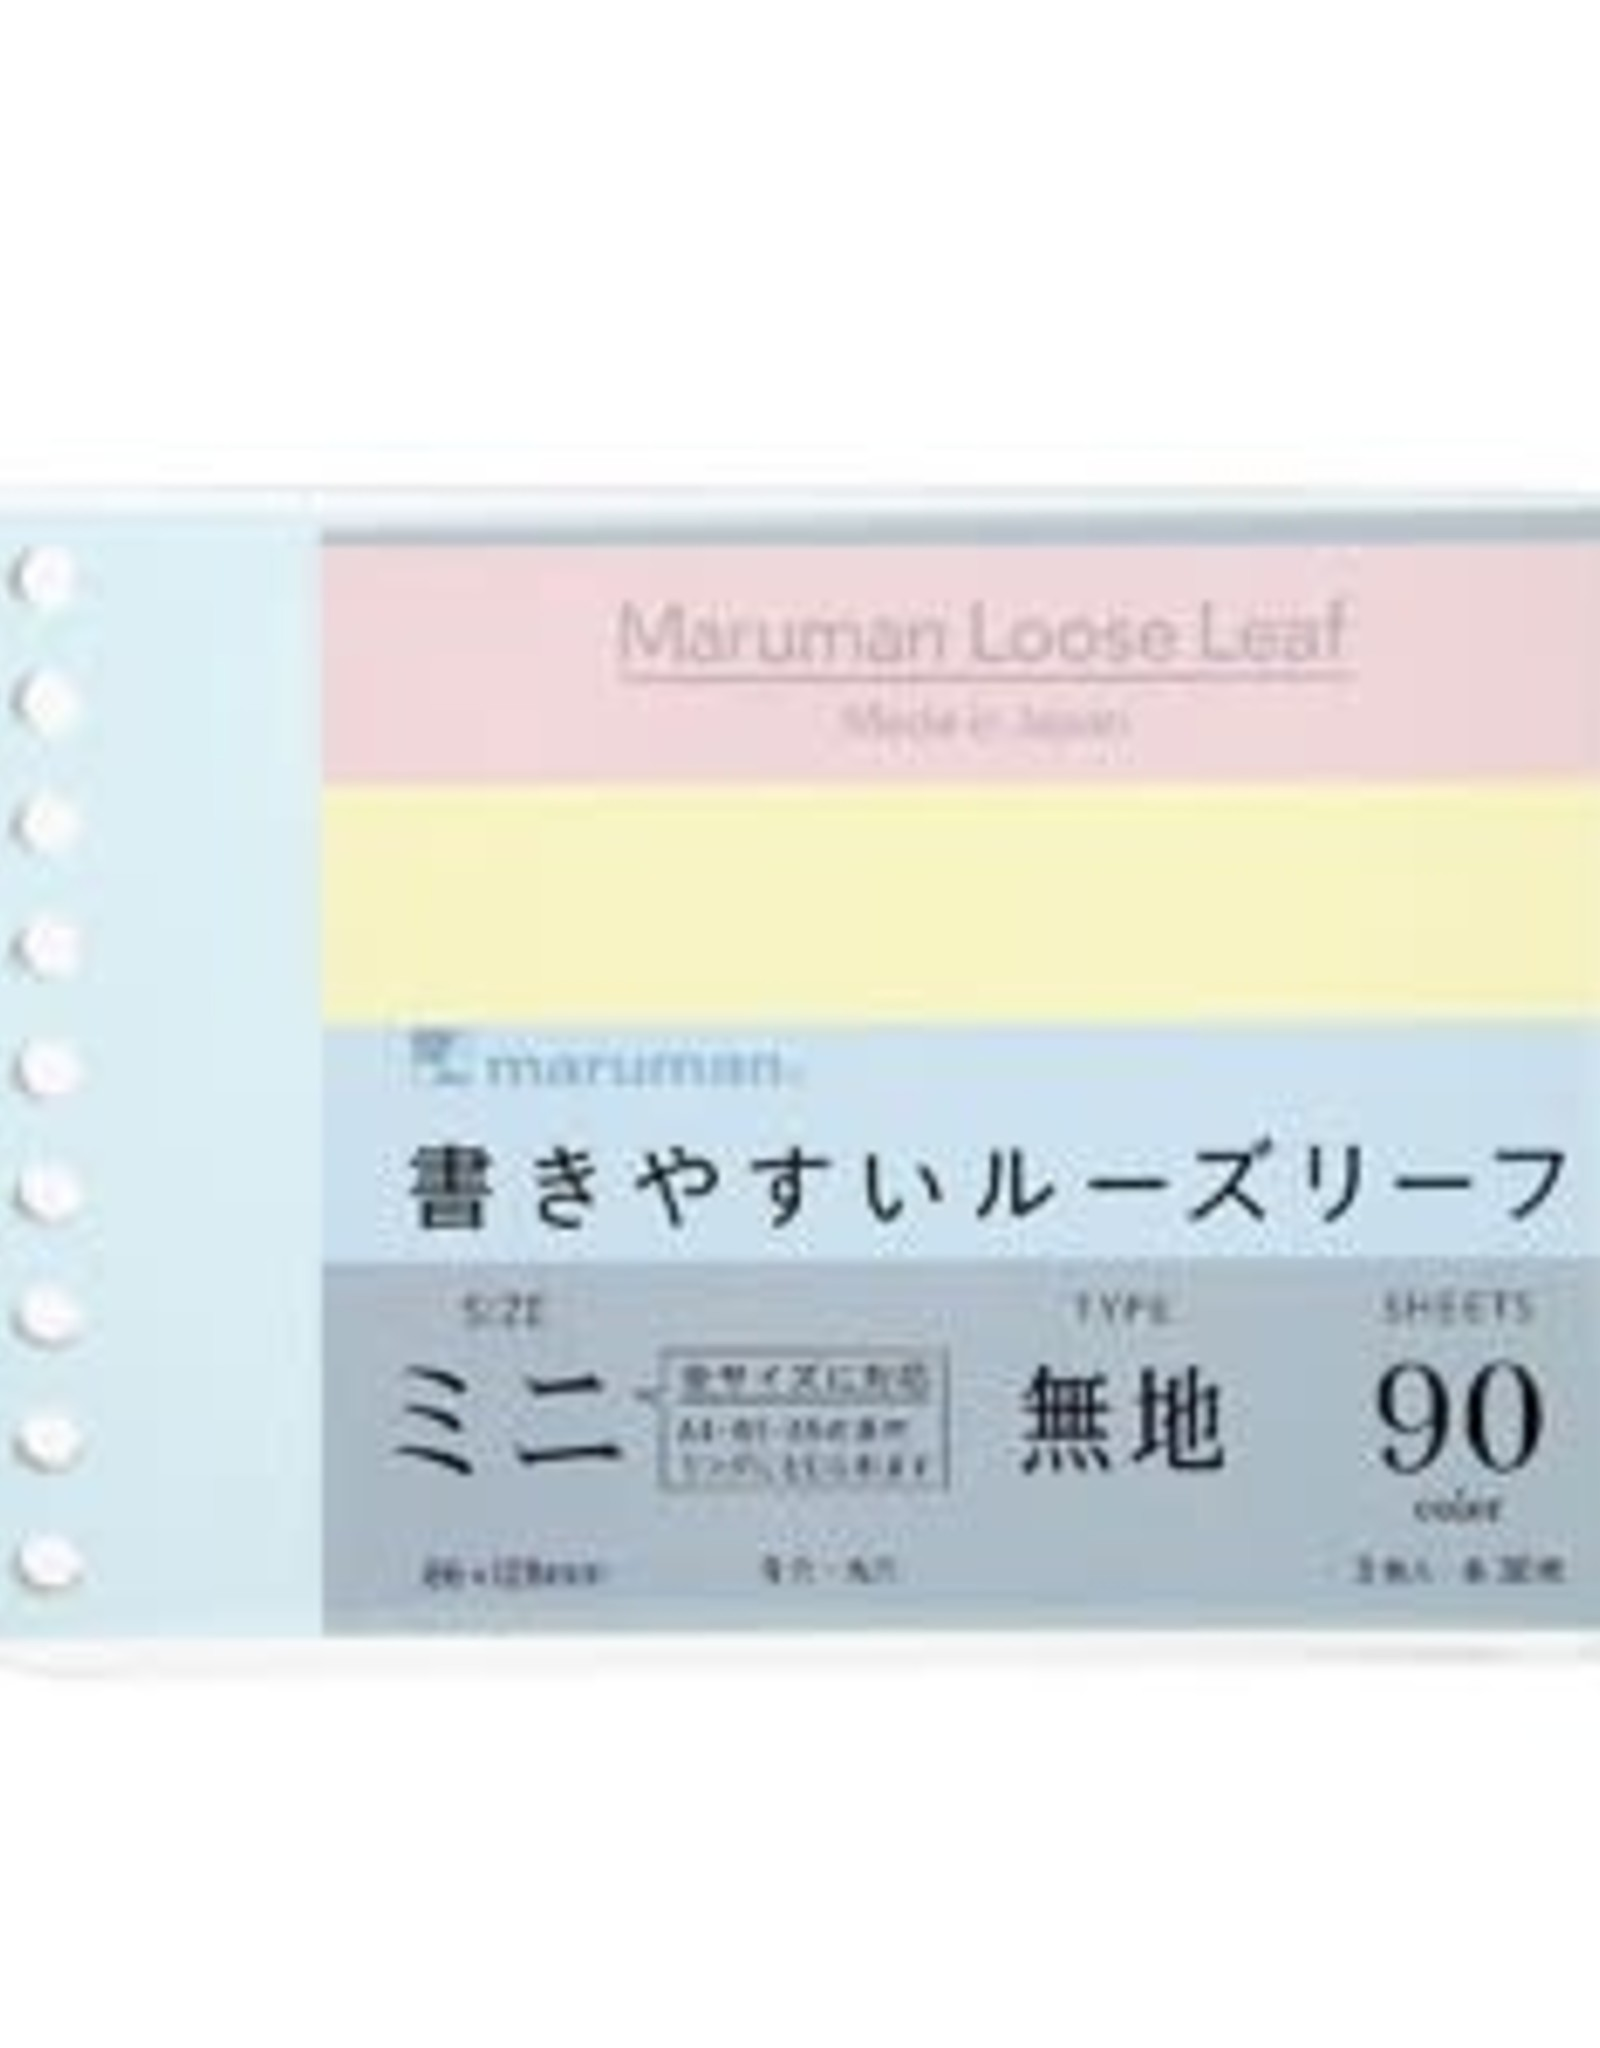 Maruman Loose Leaf Mini B7